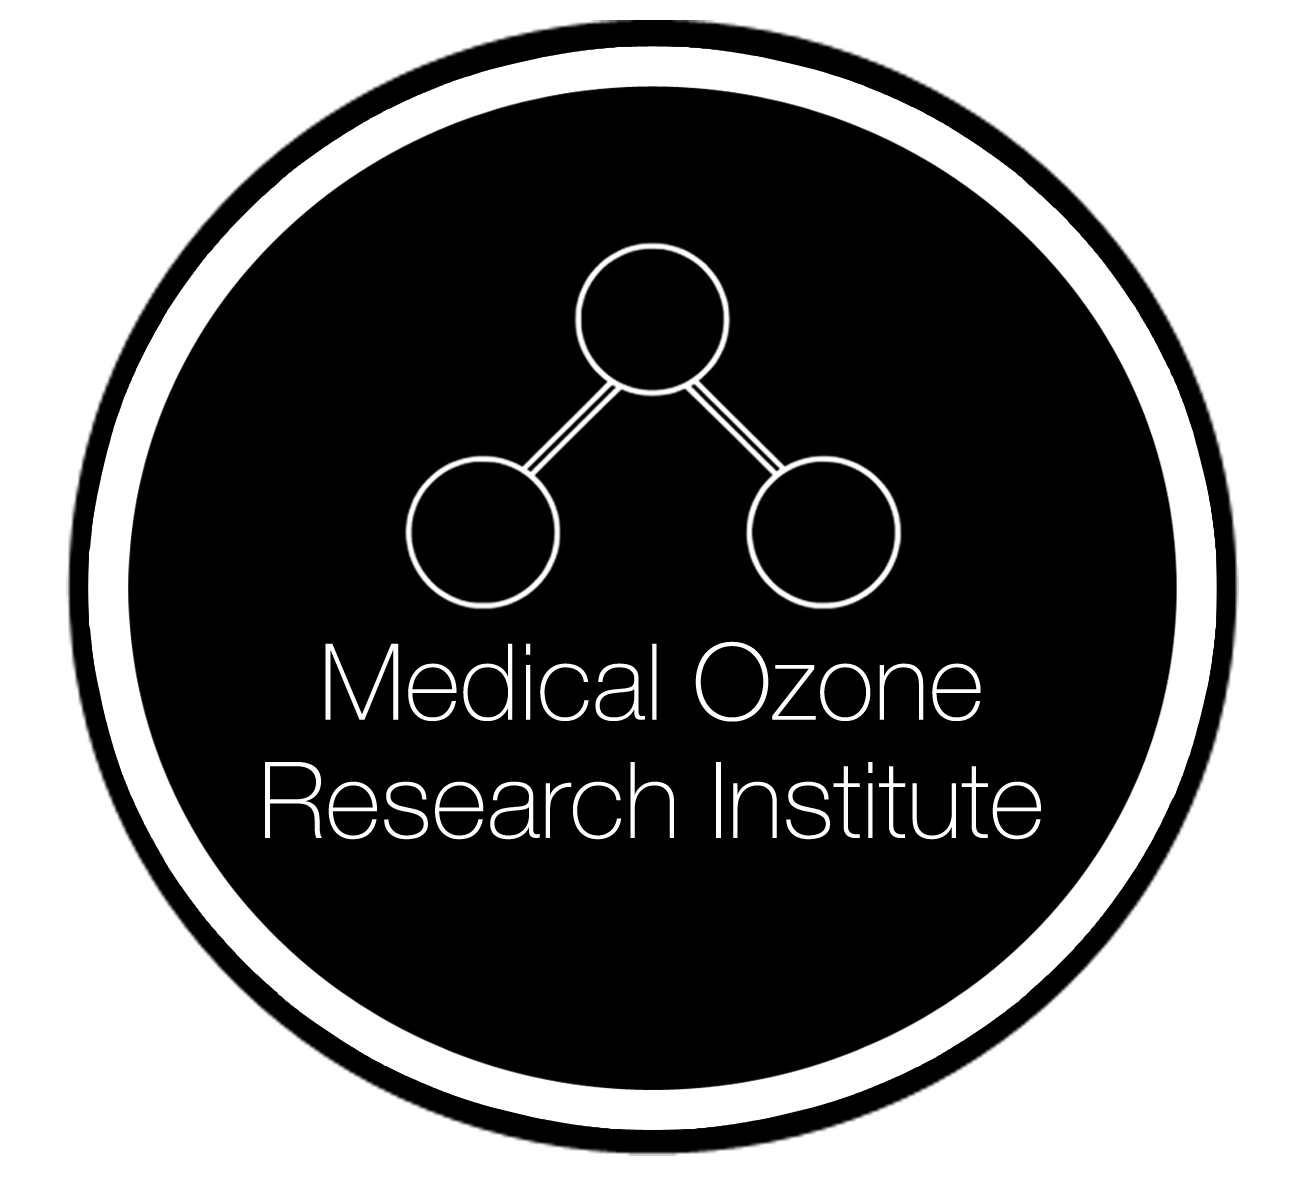 Medical Ozone Research Institute